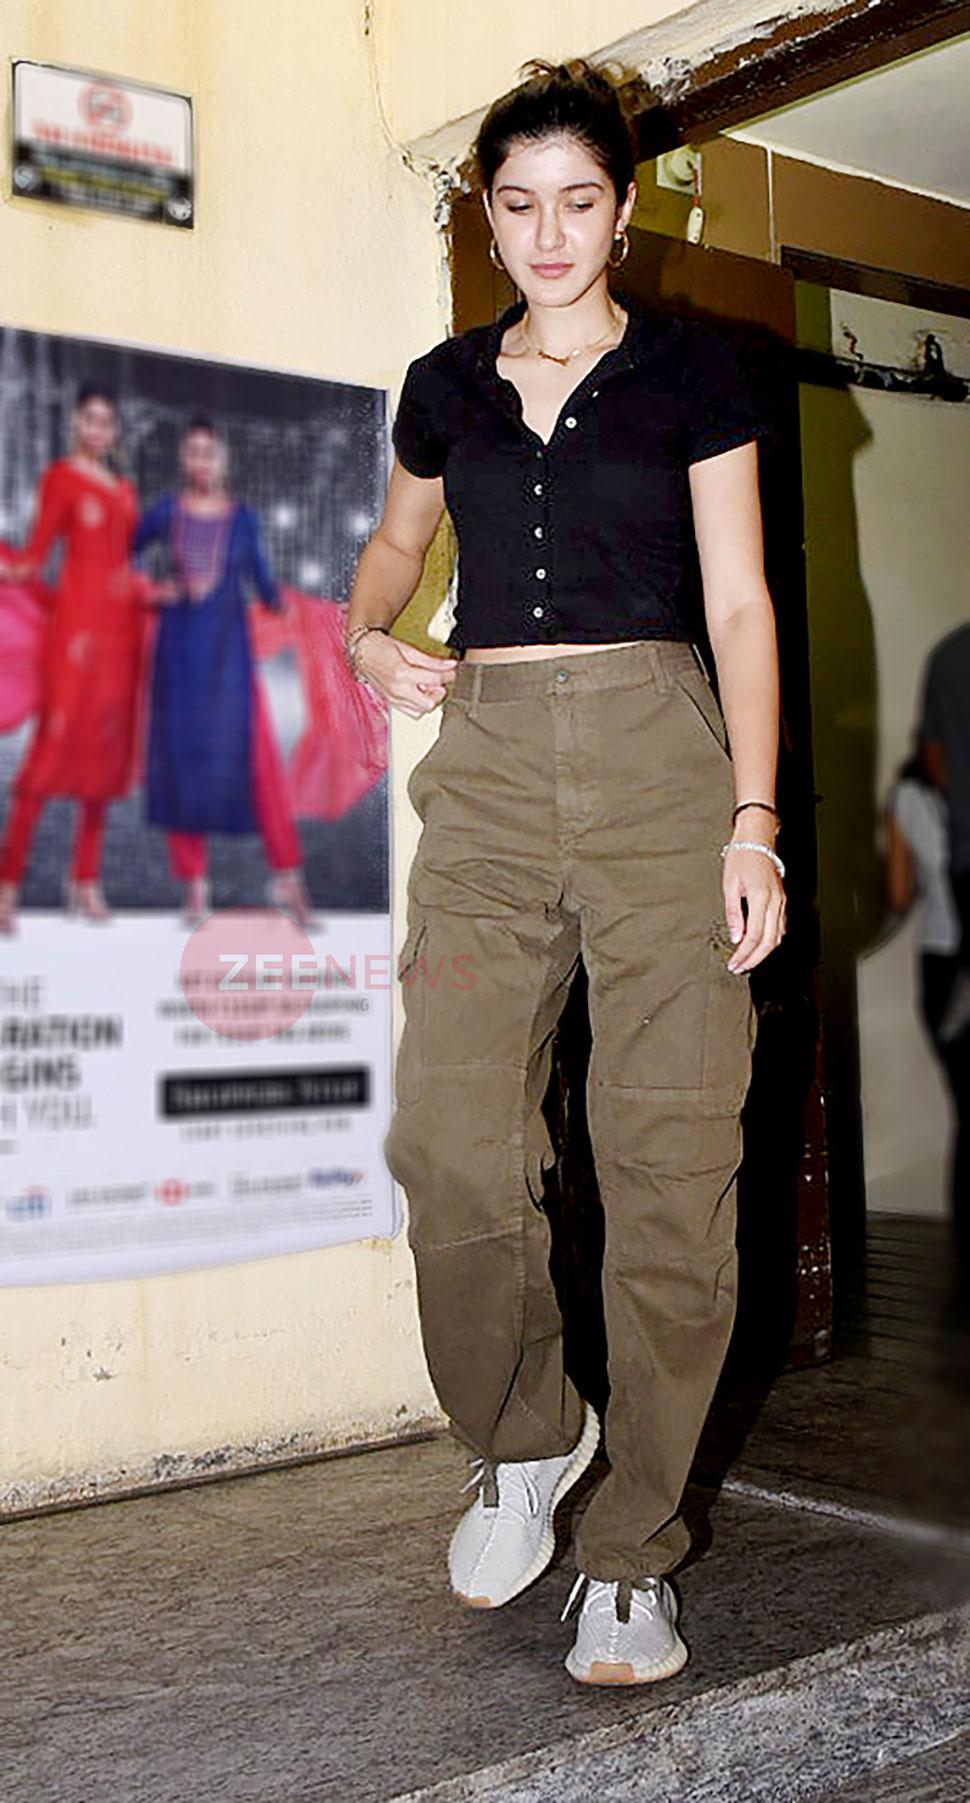 If Karan Johar directs, my tears will spill over: Shanaya Kapoor